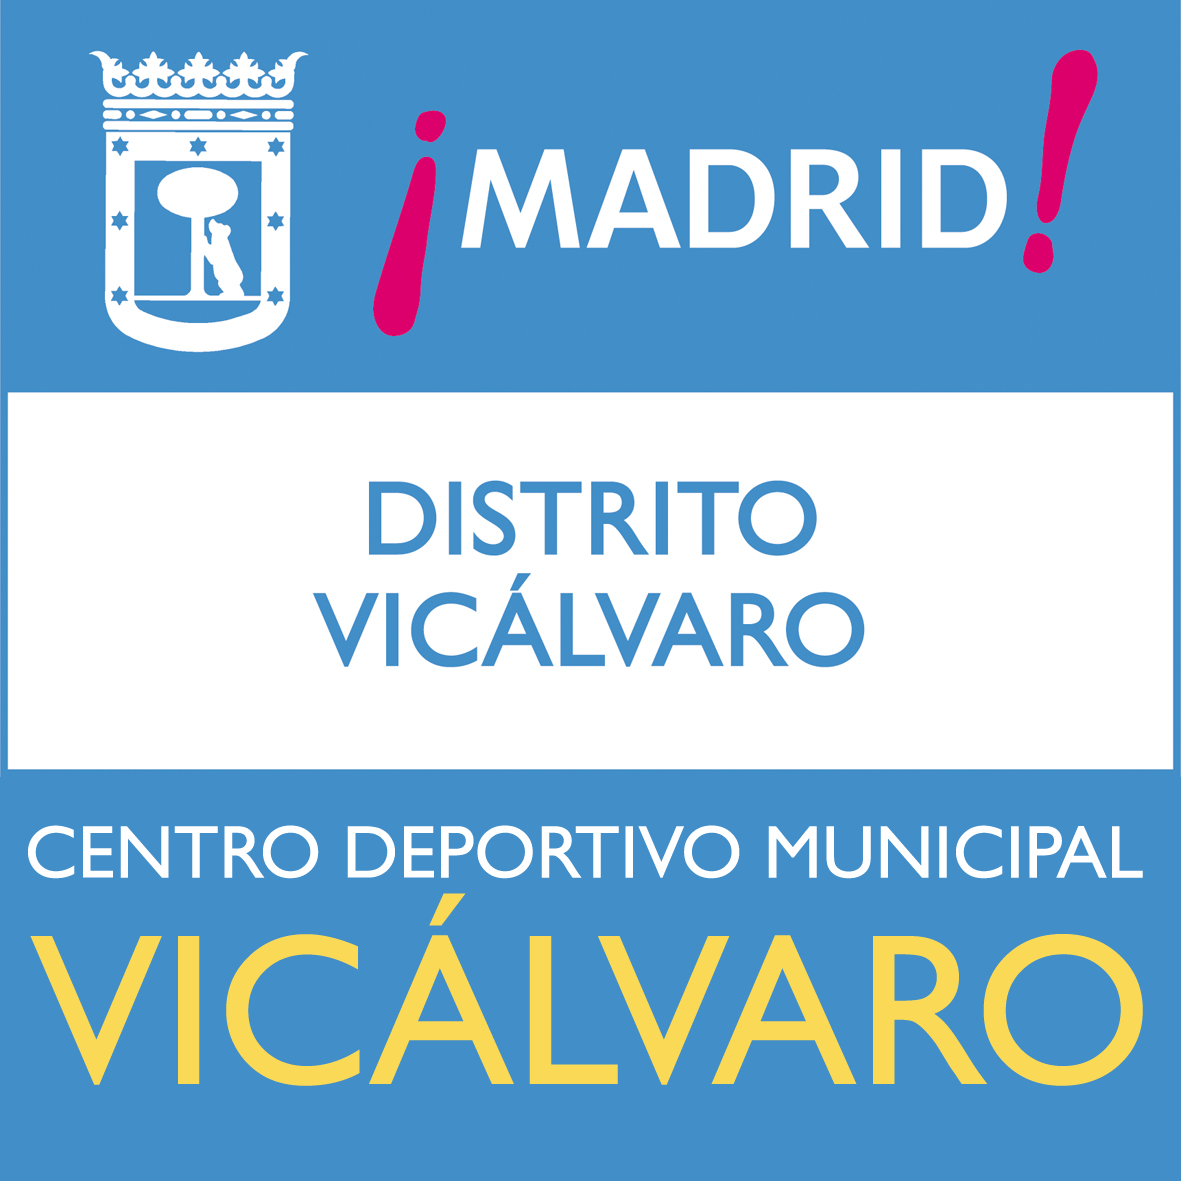 http://vicalvablog.blogspot.com.es/2014/09/35-juegos-deportivos-municipales-cdm.html